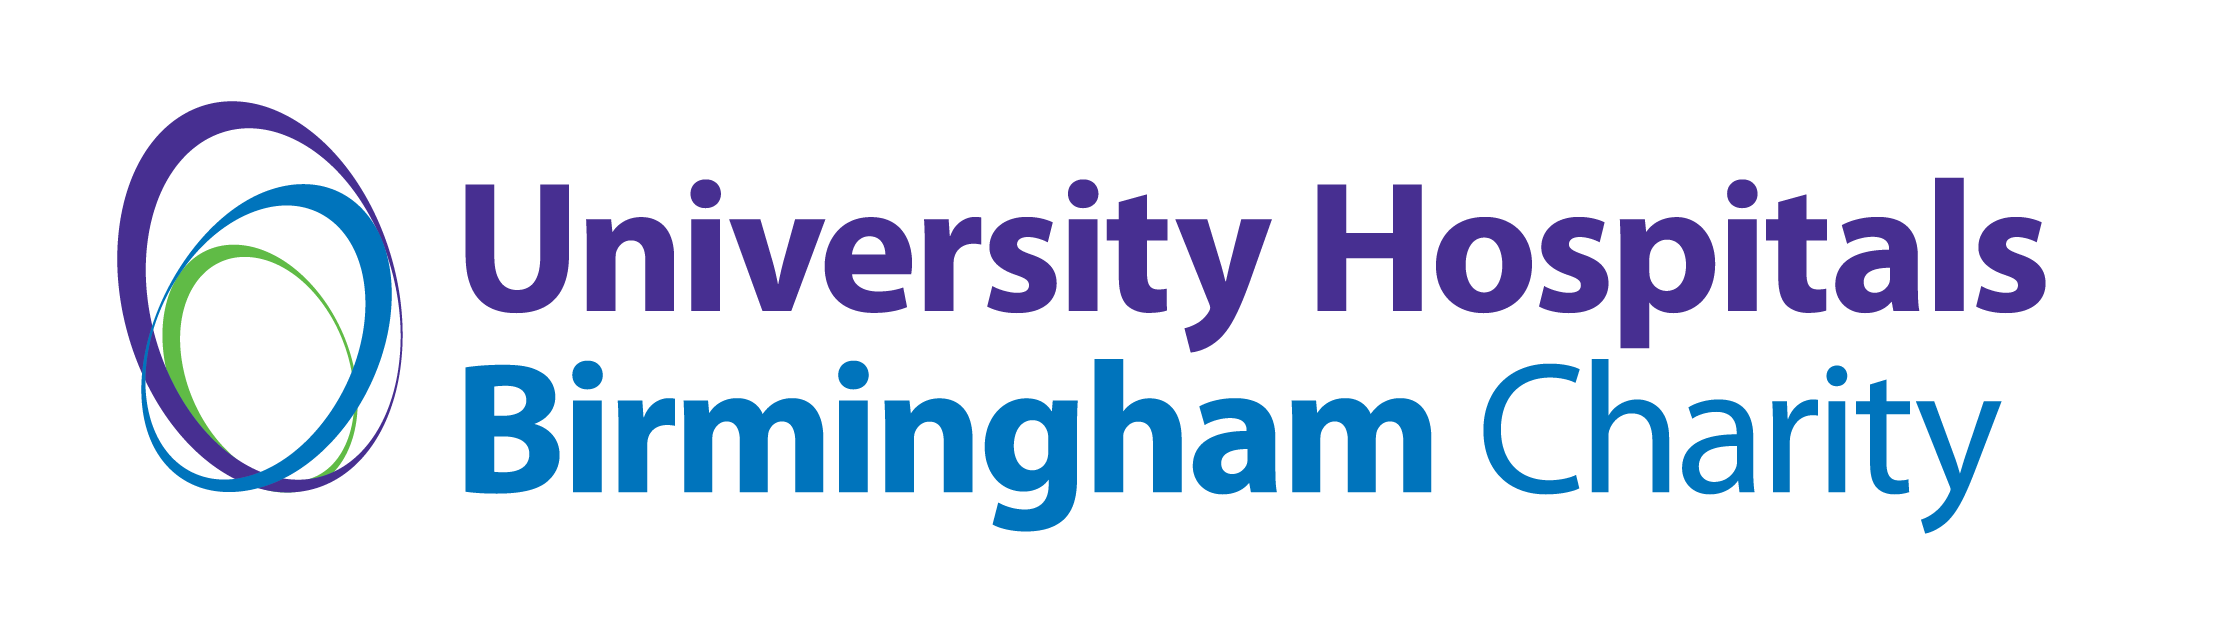 University_Hospitals_Birmingham_Charity_landscape_(RGB).png